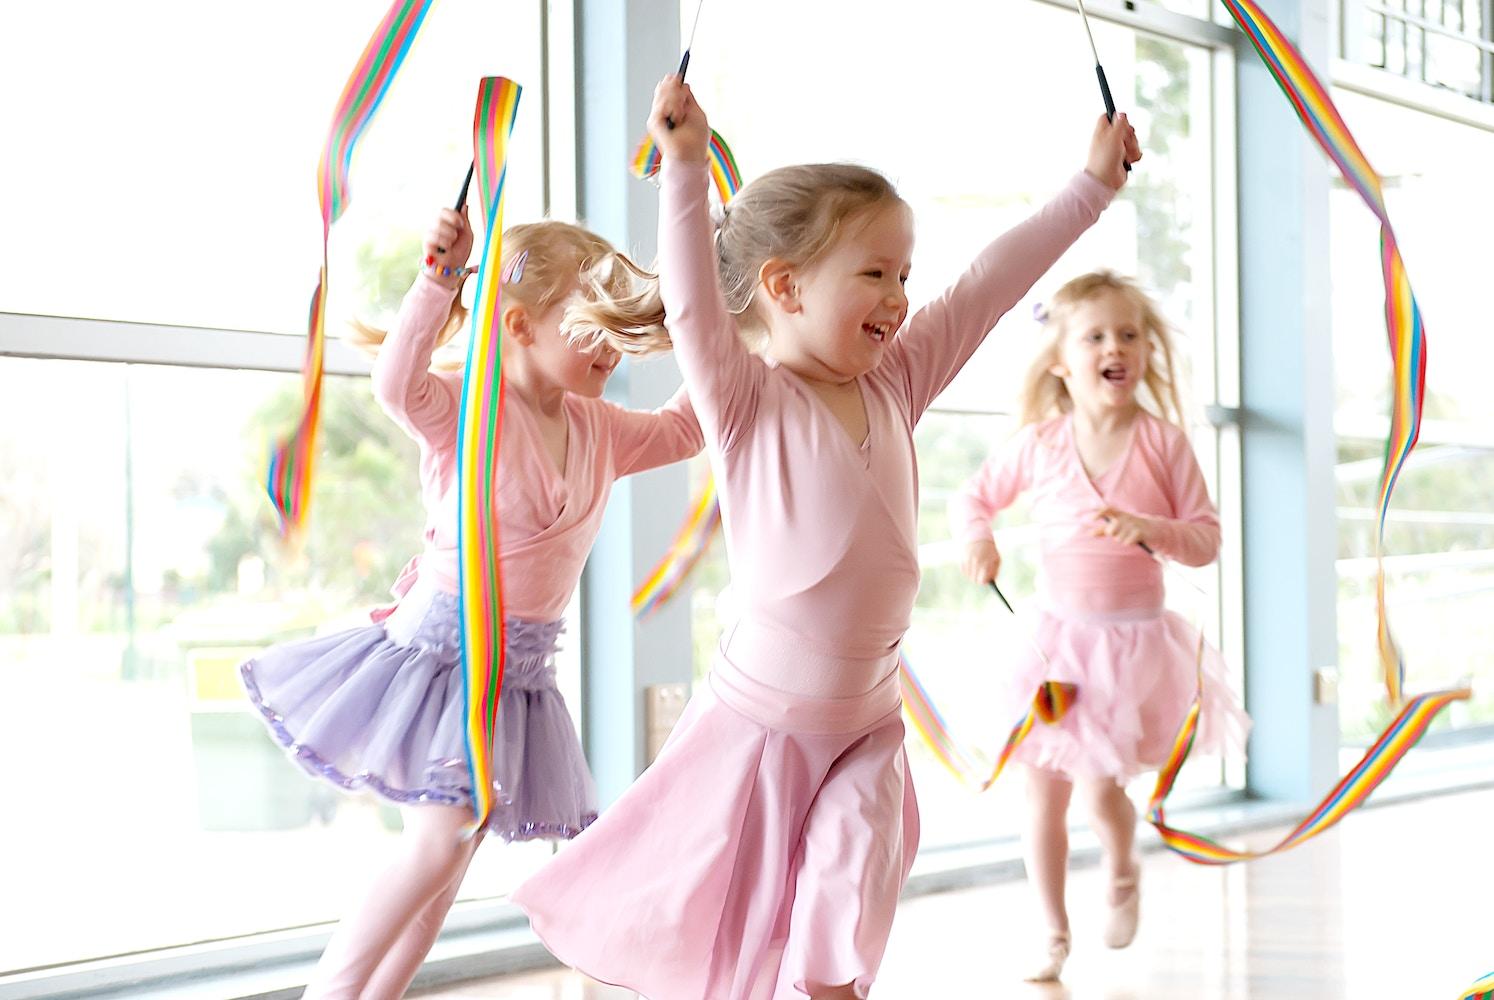 Kinderballet | Learn to Dance Preschool Ballet Program